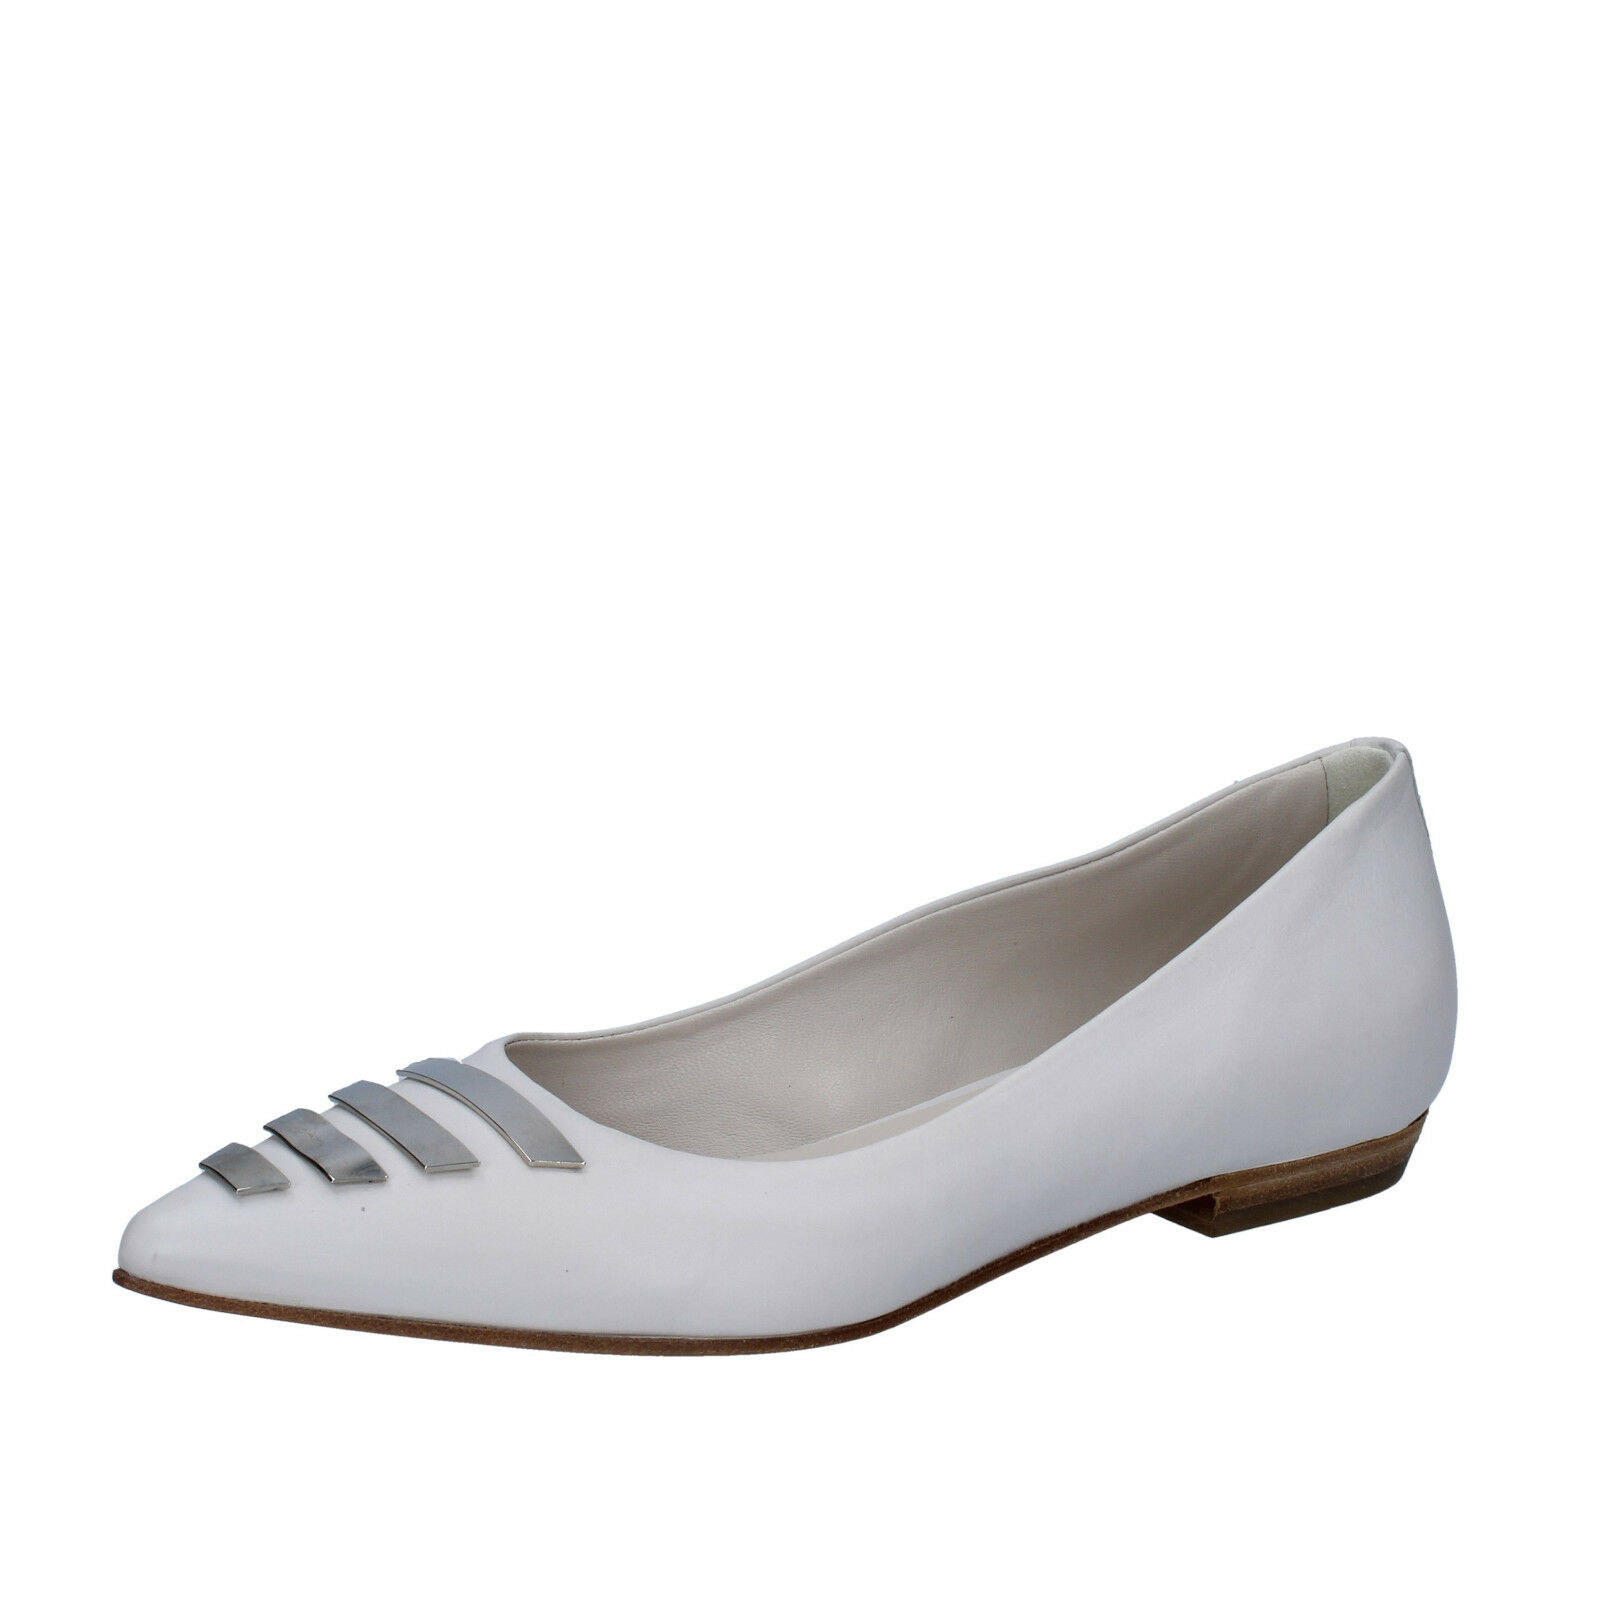 Scarpe donna VIC 37 BZ510-B EU ballerine bianco pelle BZ510-B 37 cbffa2